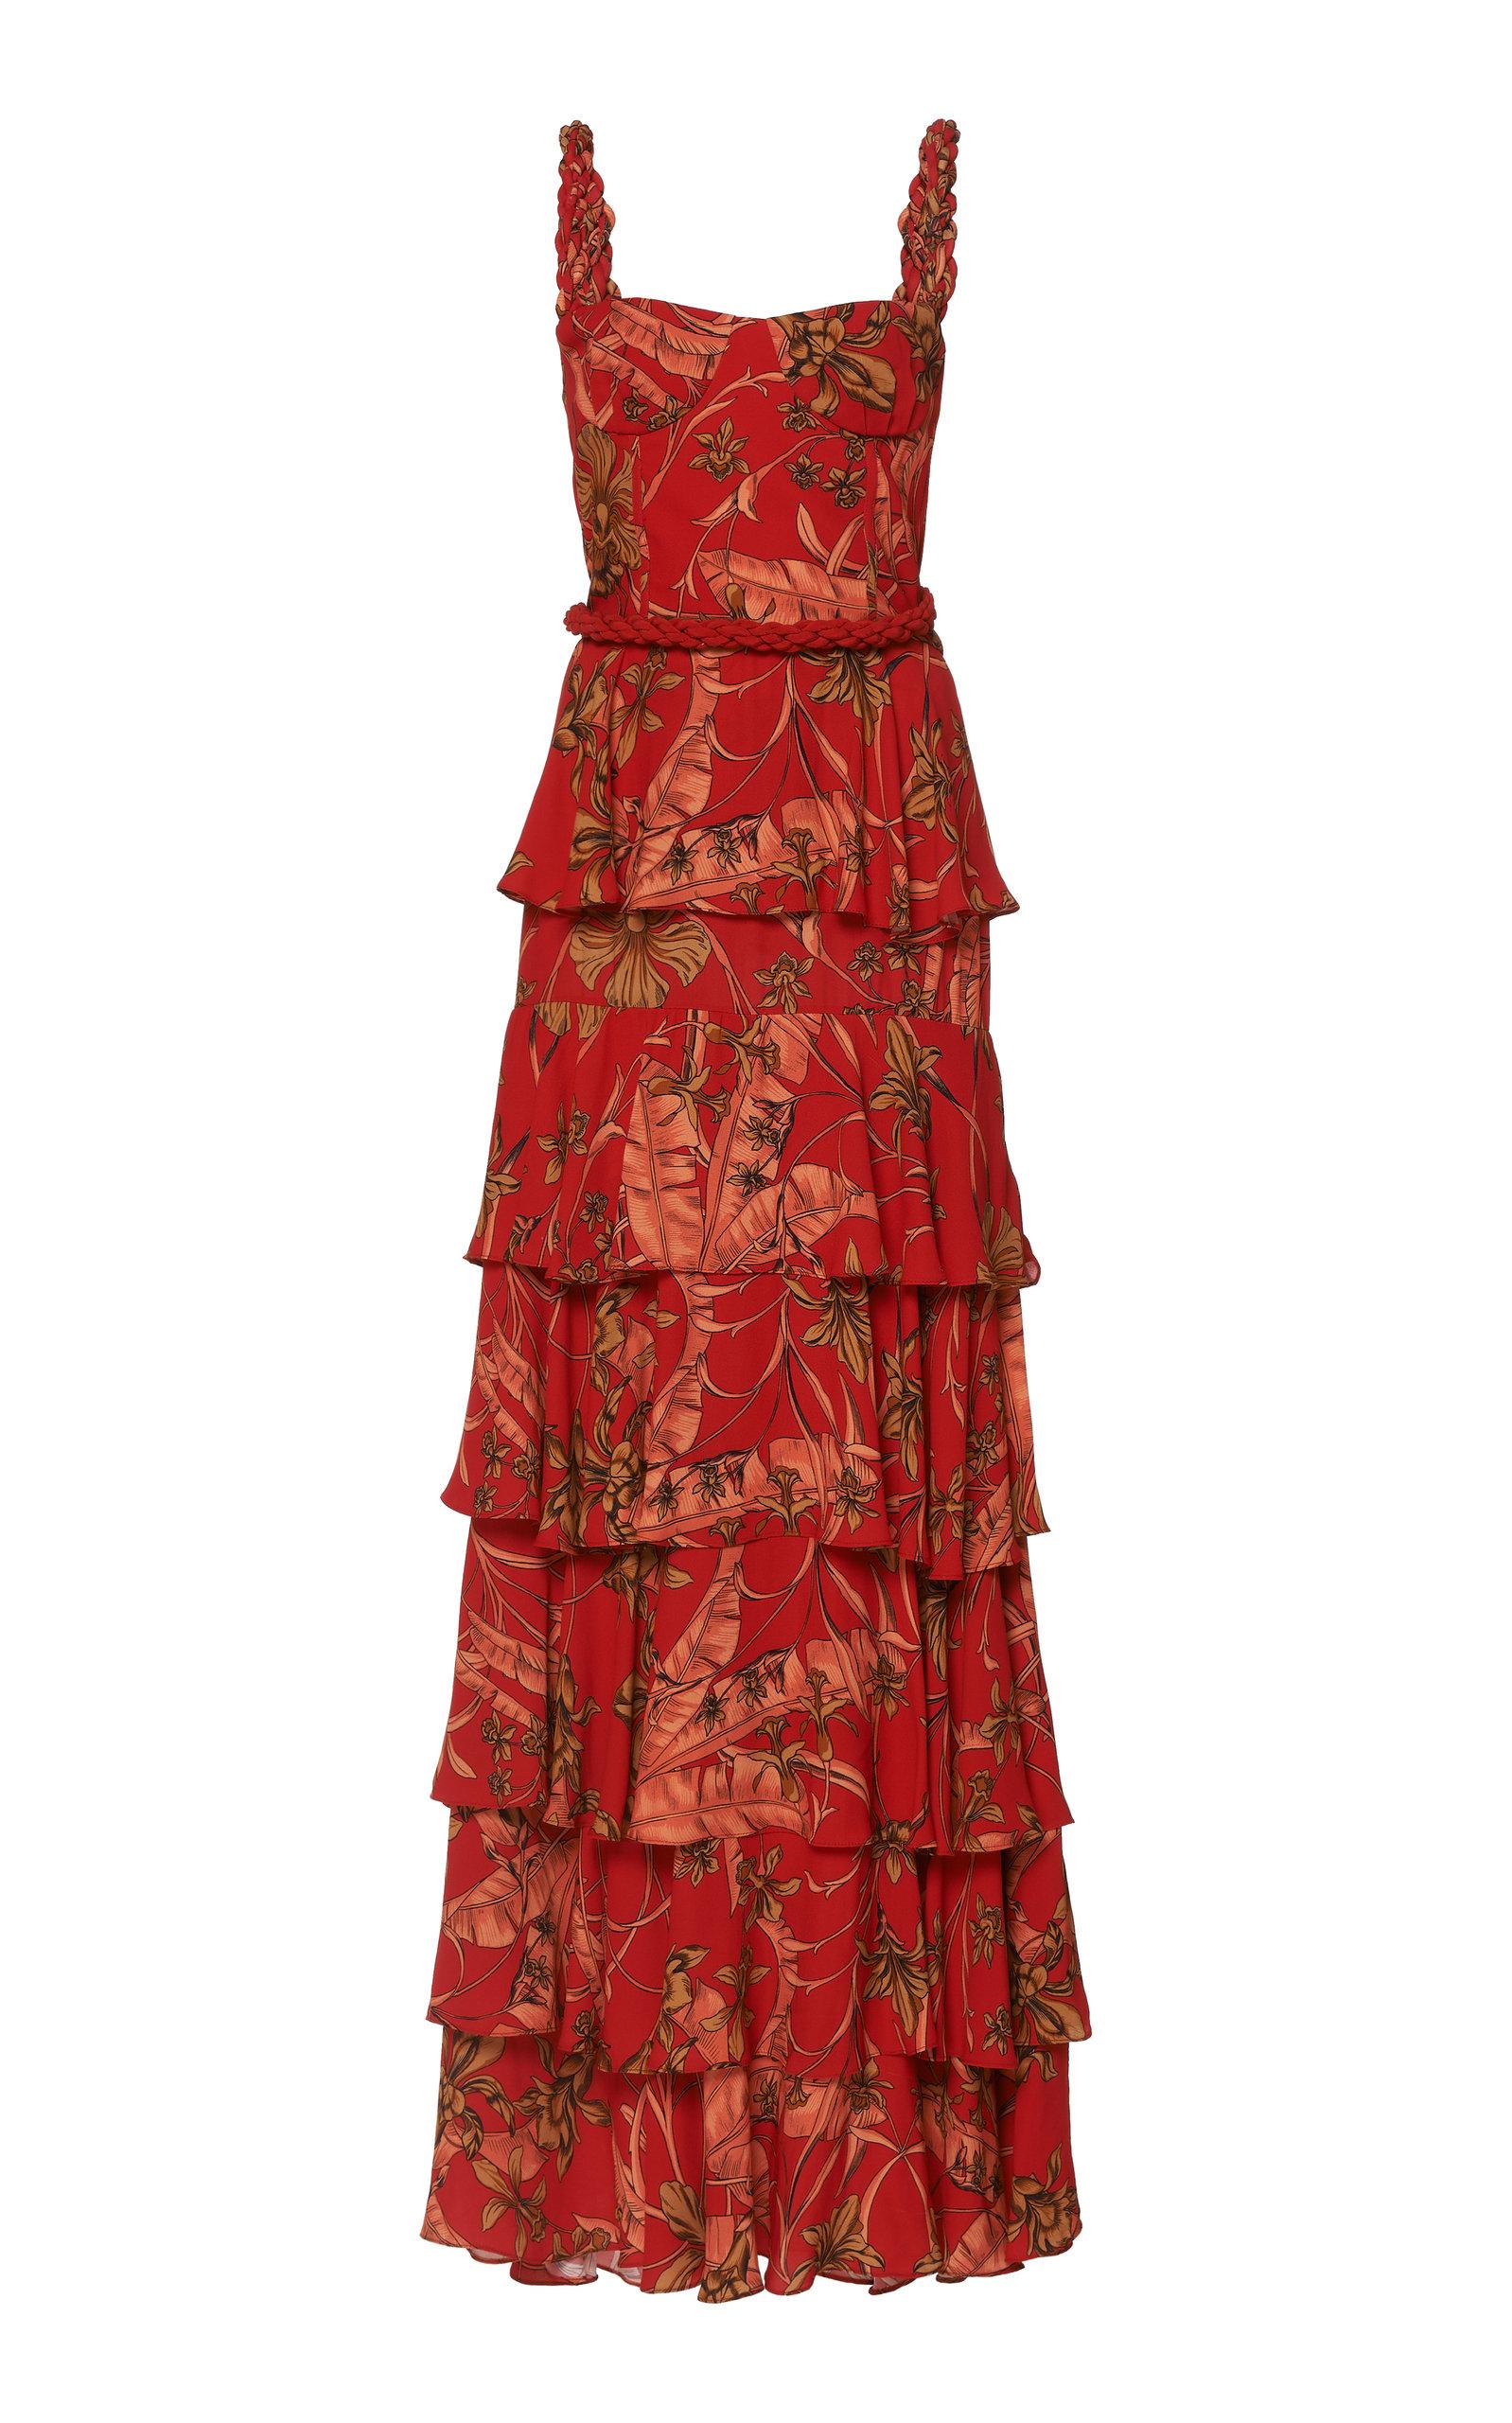 Buy Johanna Ortiz Life Goals Printed Tiered Maxi Dress online, shop Johanna Ortiz at the best price